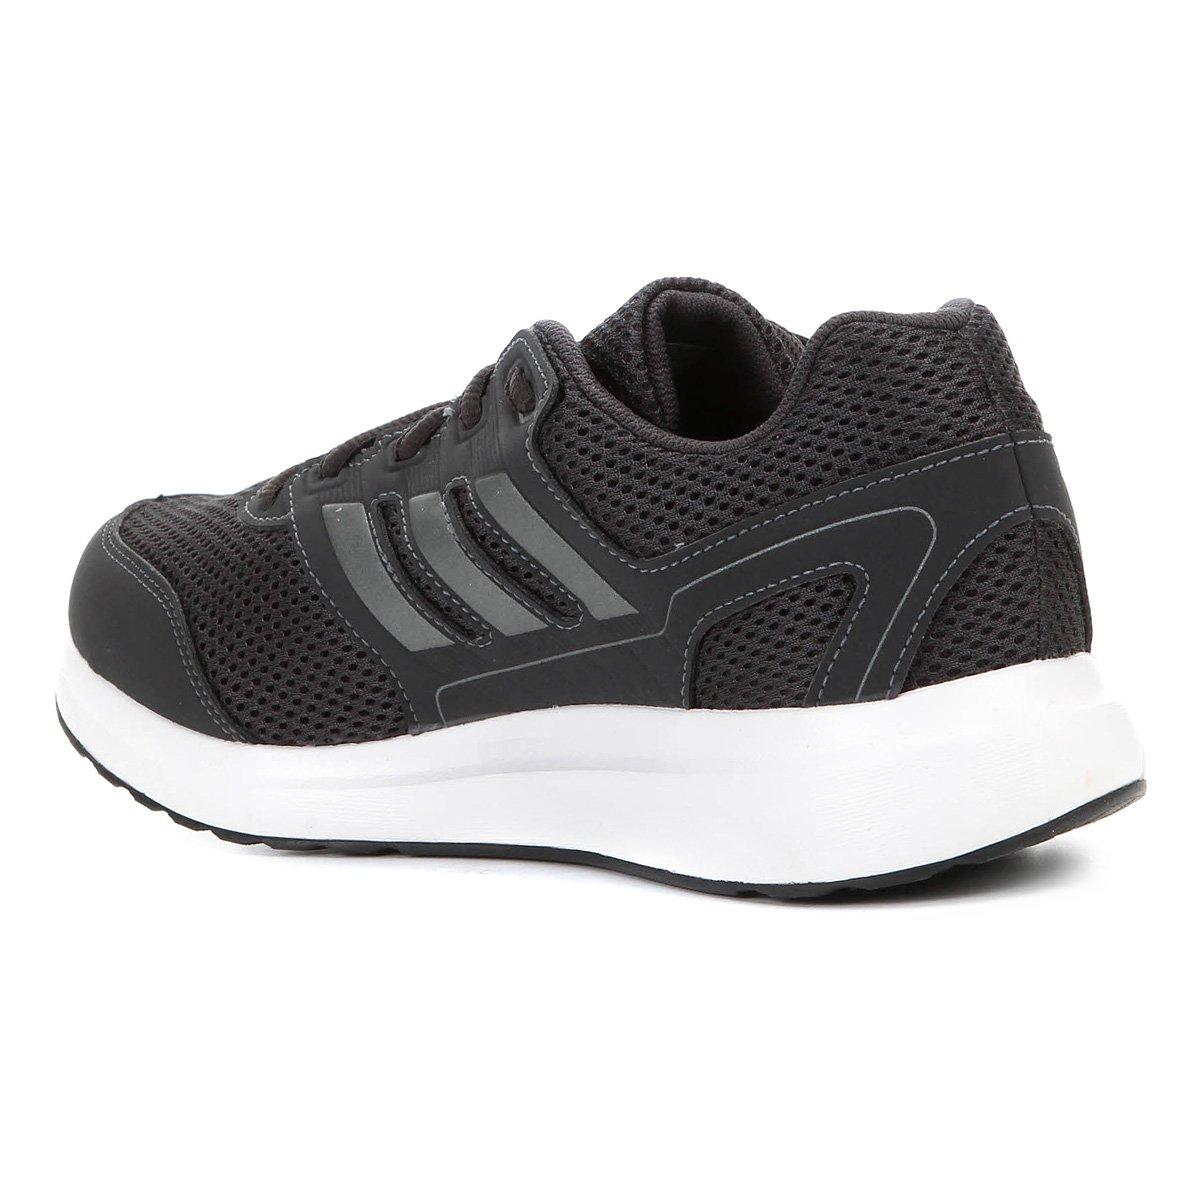 Tênis Adidas Duramo Lite 2 0 Masculino - Cinza e Preto - Compre ... bd20d6e46d3ca